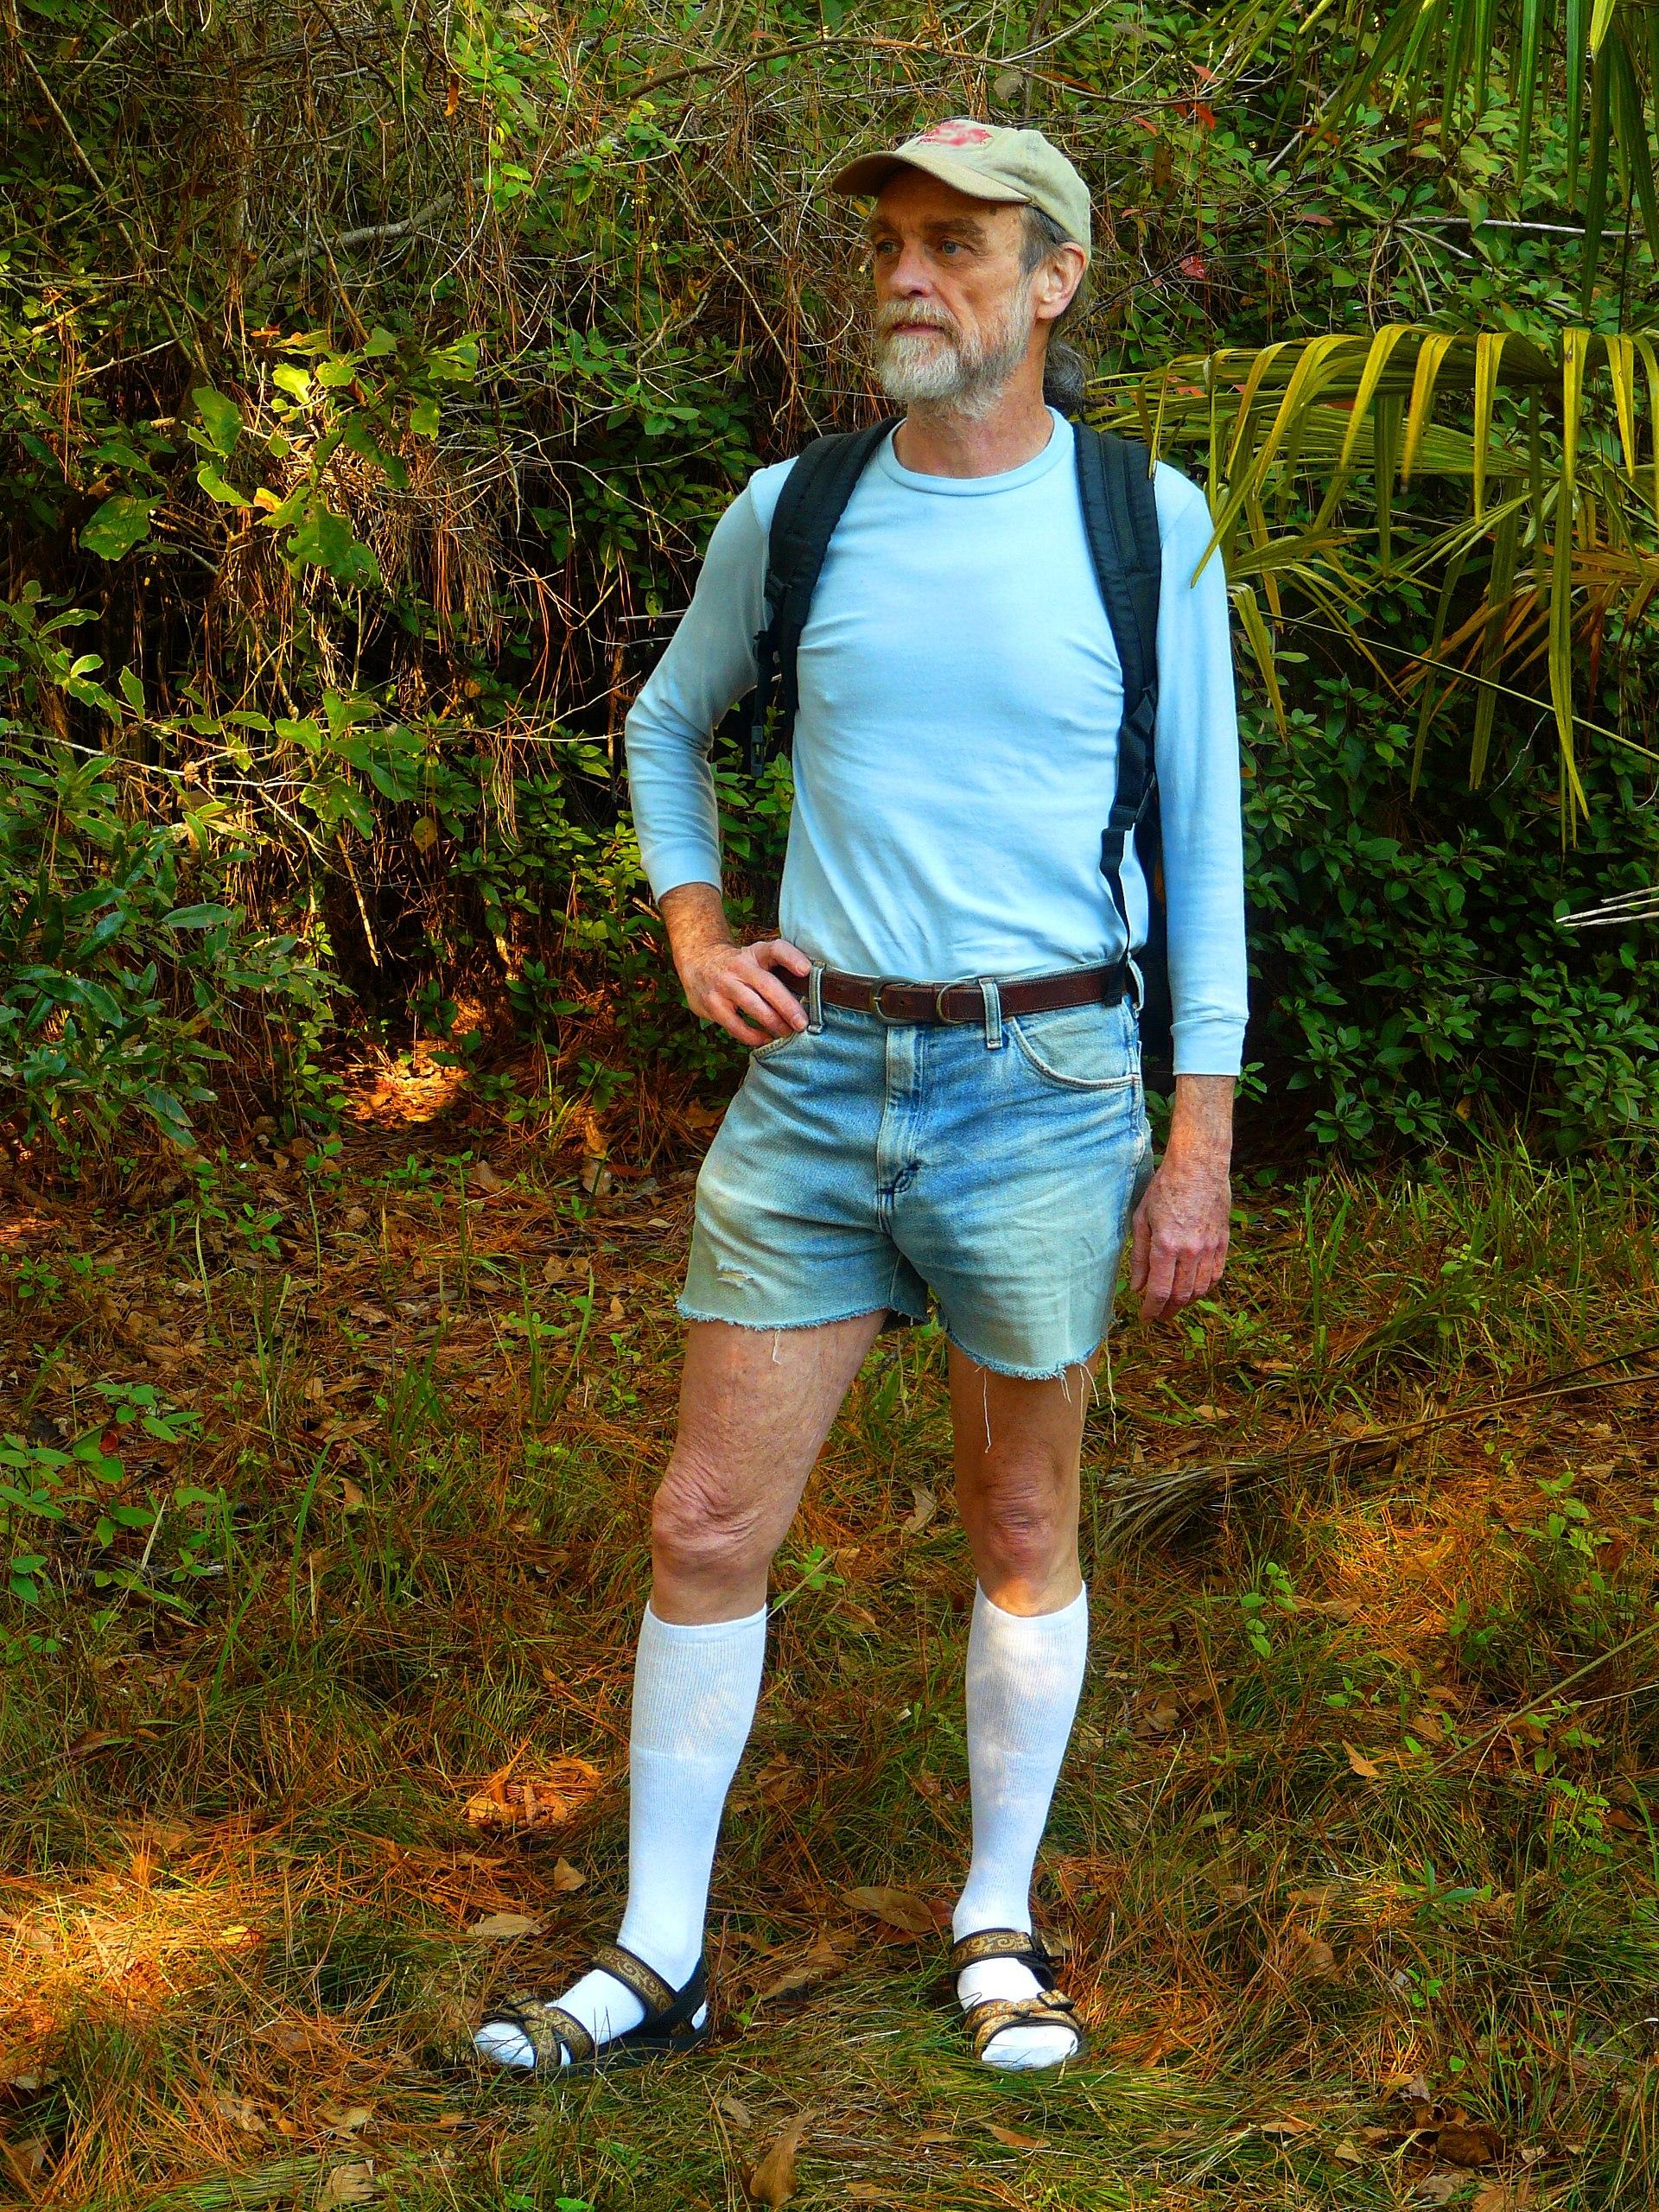 Socks and sandals - Wikipedia